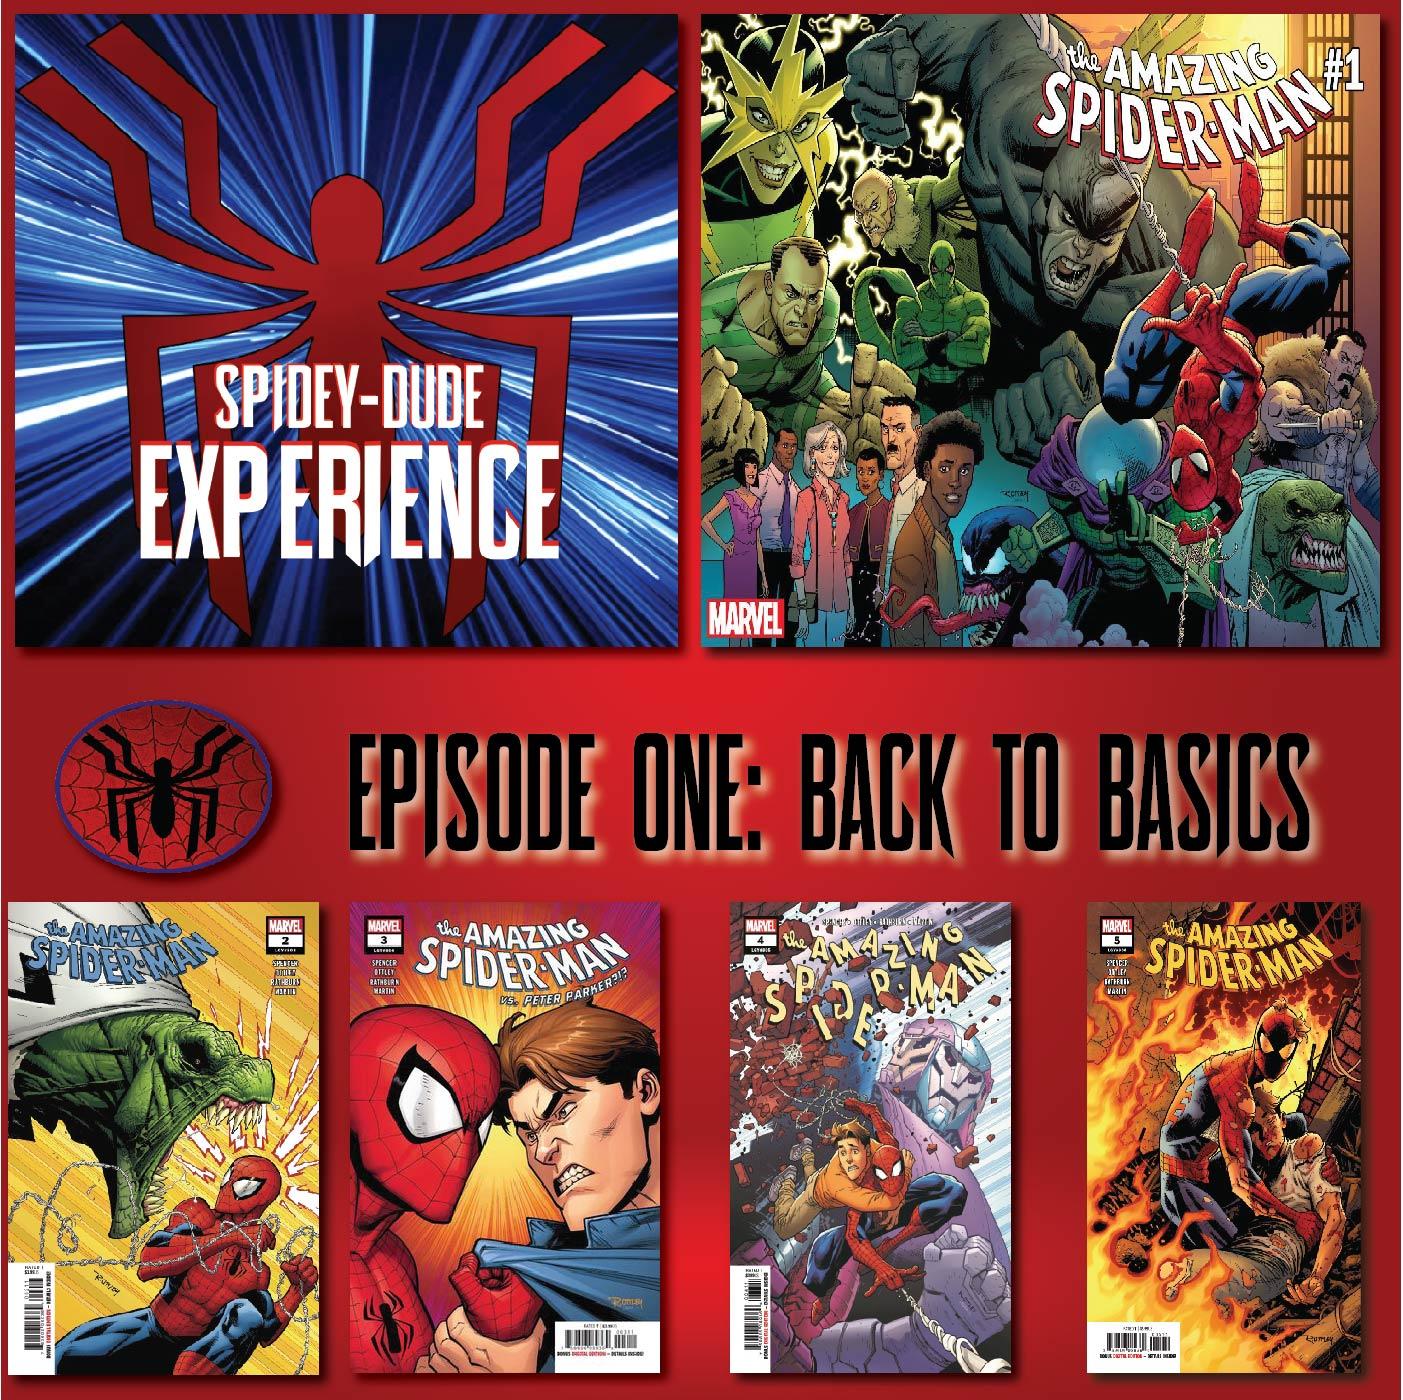 The SPIDEYDUDE EXPERIENCE EPISODE ONE: Back to Basics [Amazing Spider-Man 802-806 & FCBD 2018]